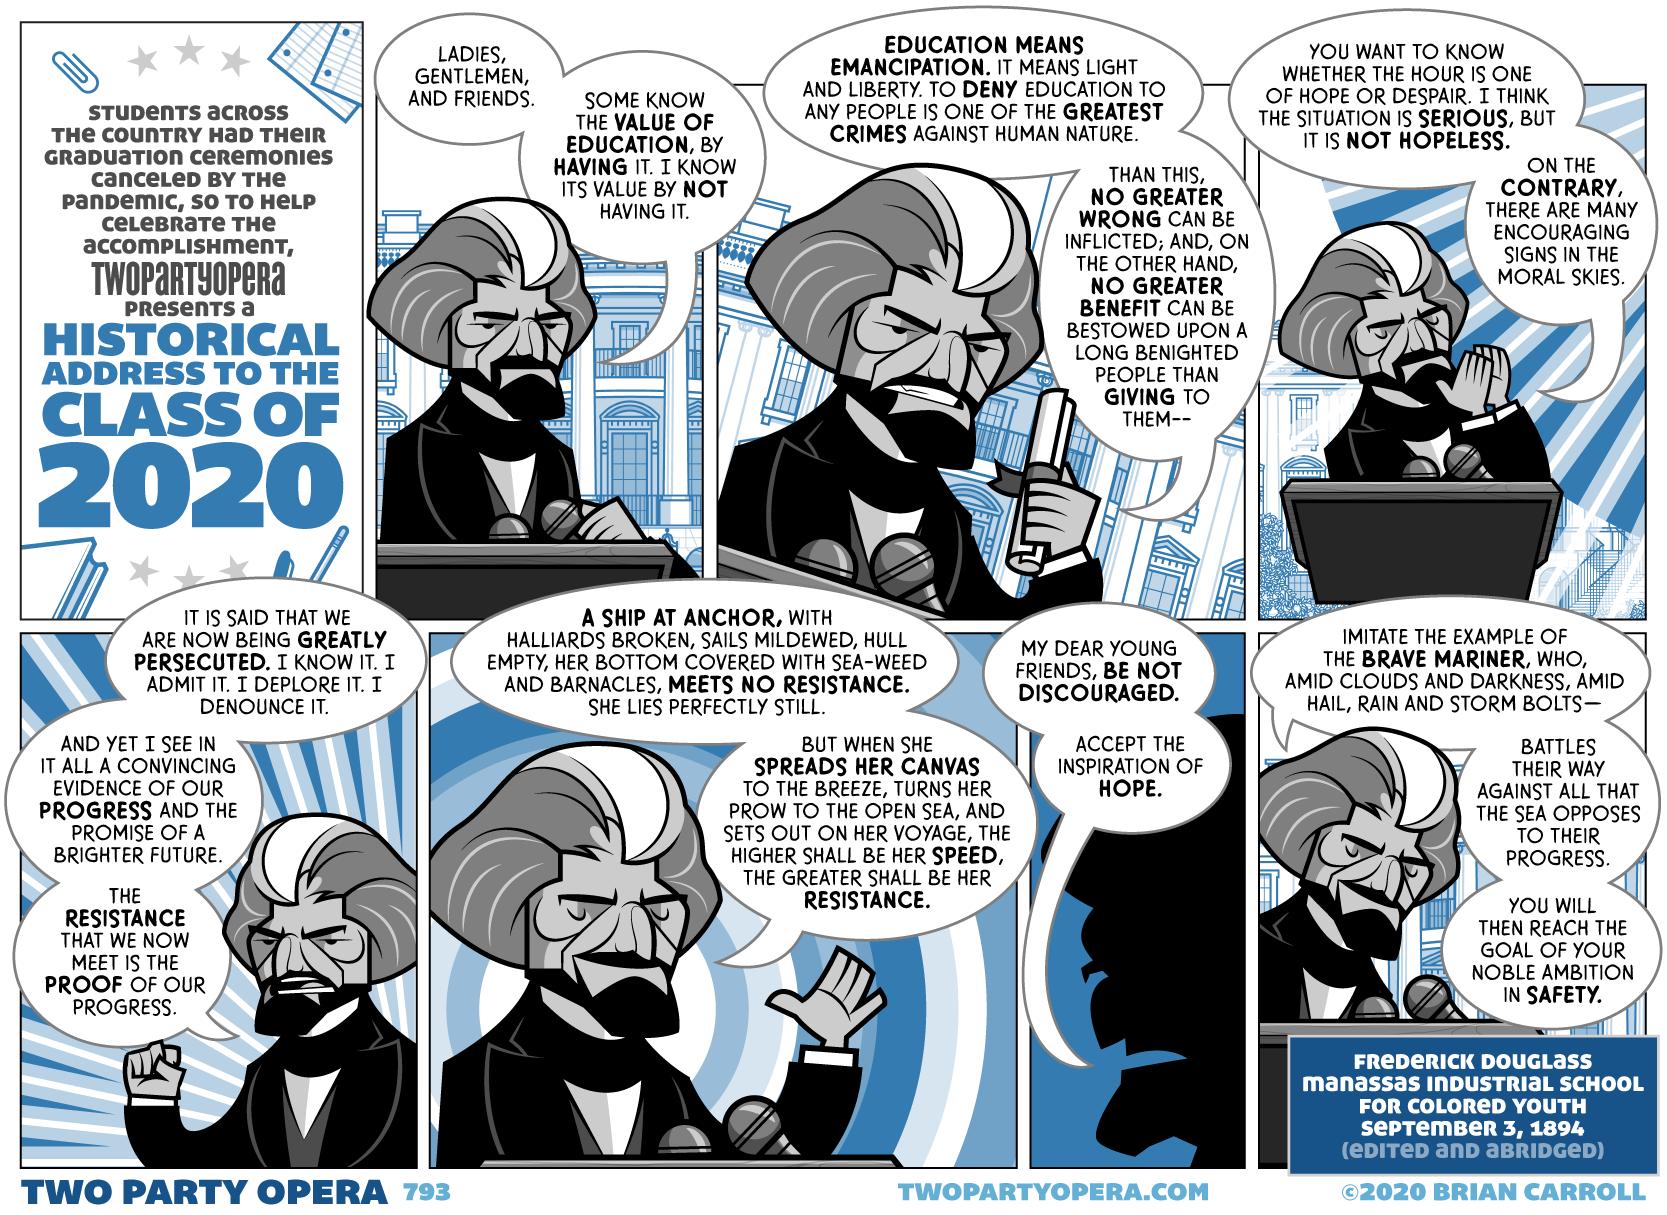 Douglass Addresses the Class of 2020